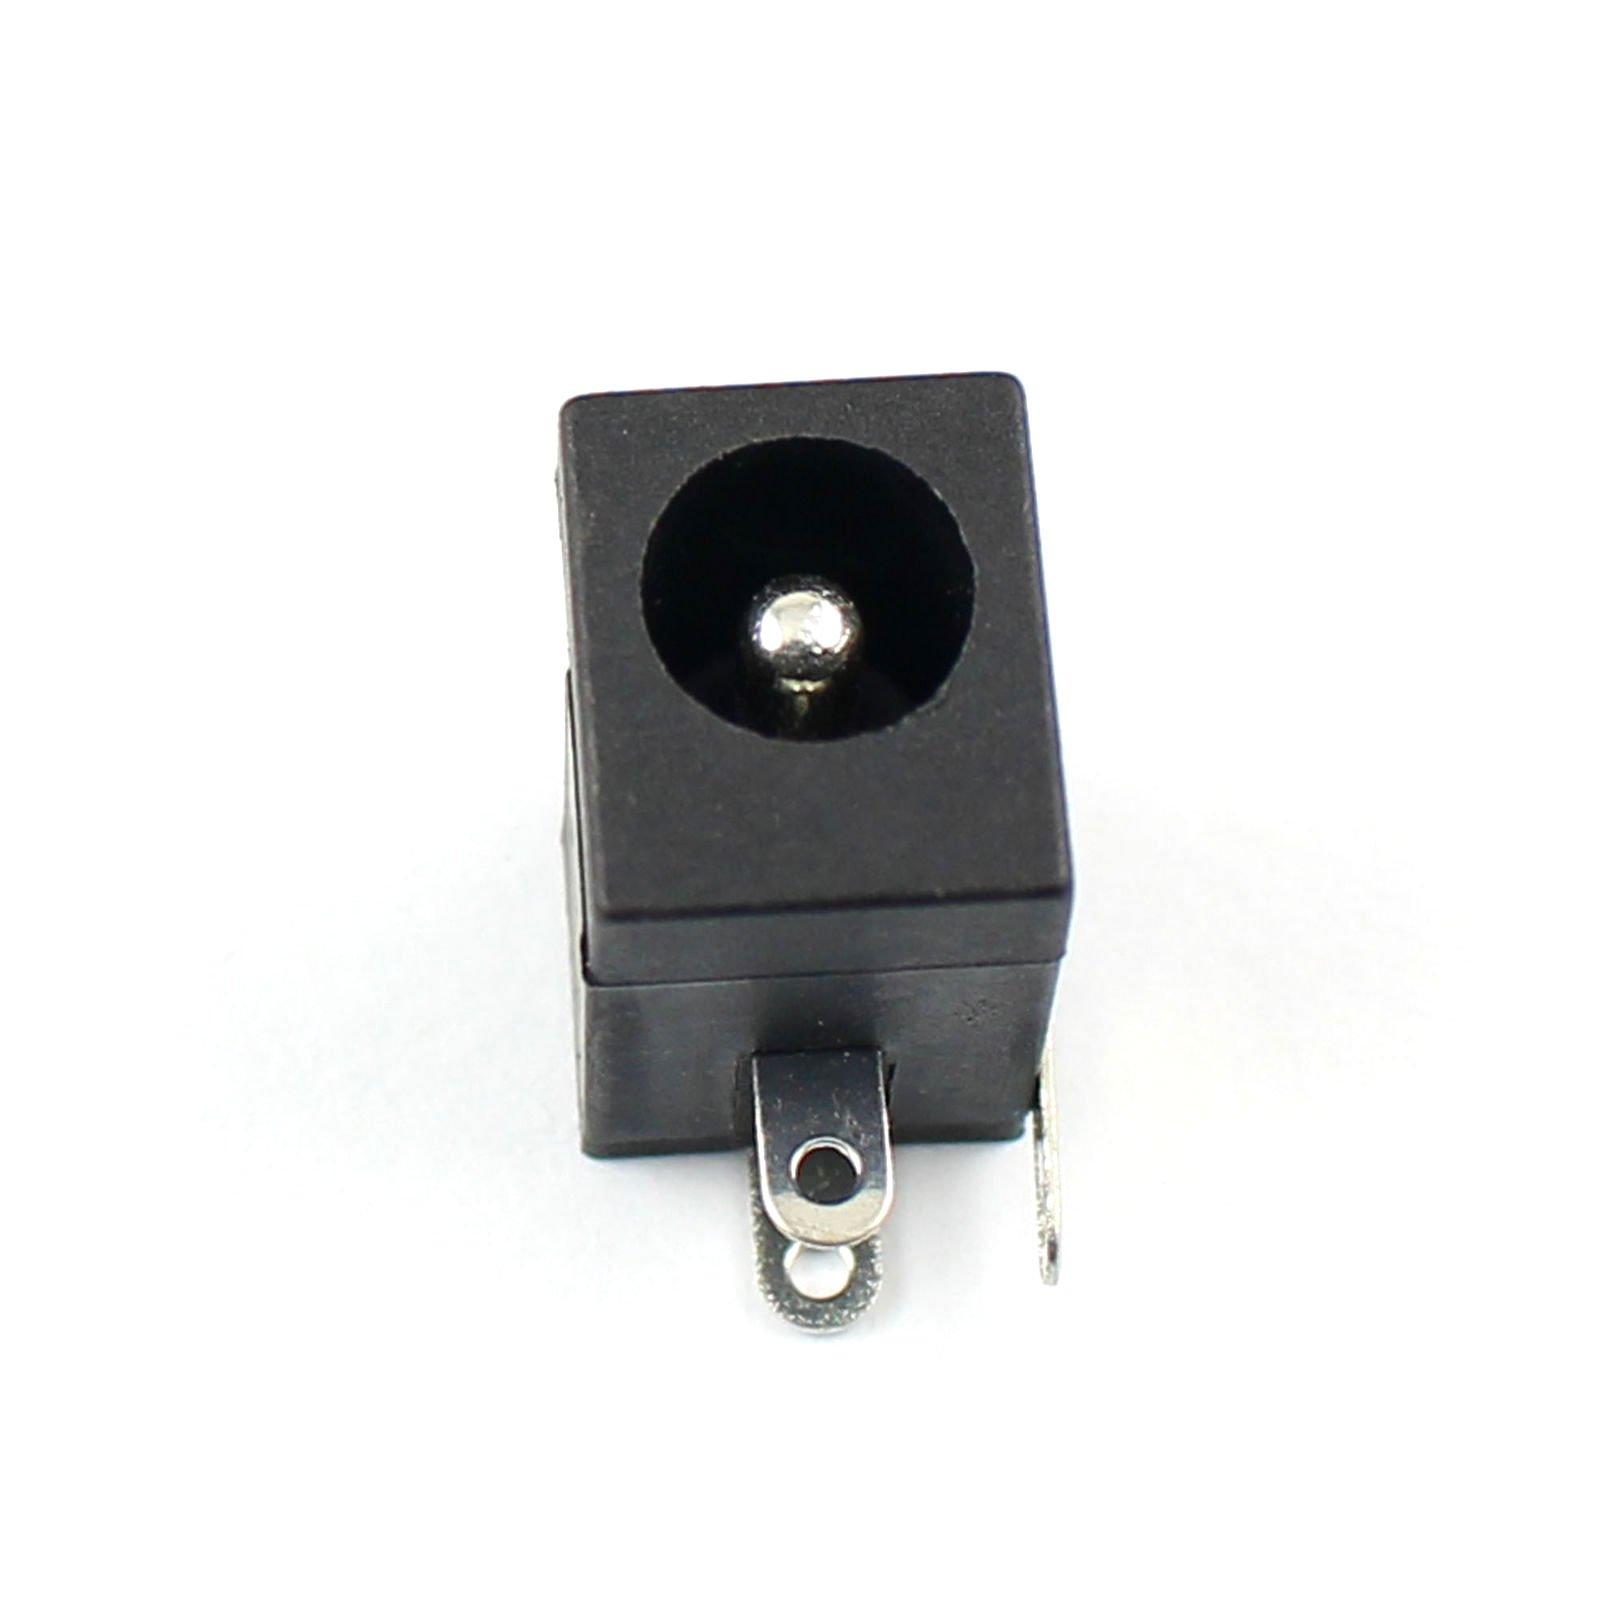 DC-005 5.5x2.1mm Female DC Power Jack Supply Socket -5Pcs.